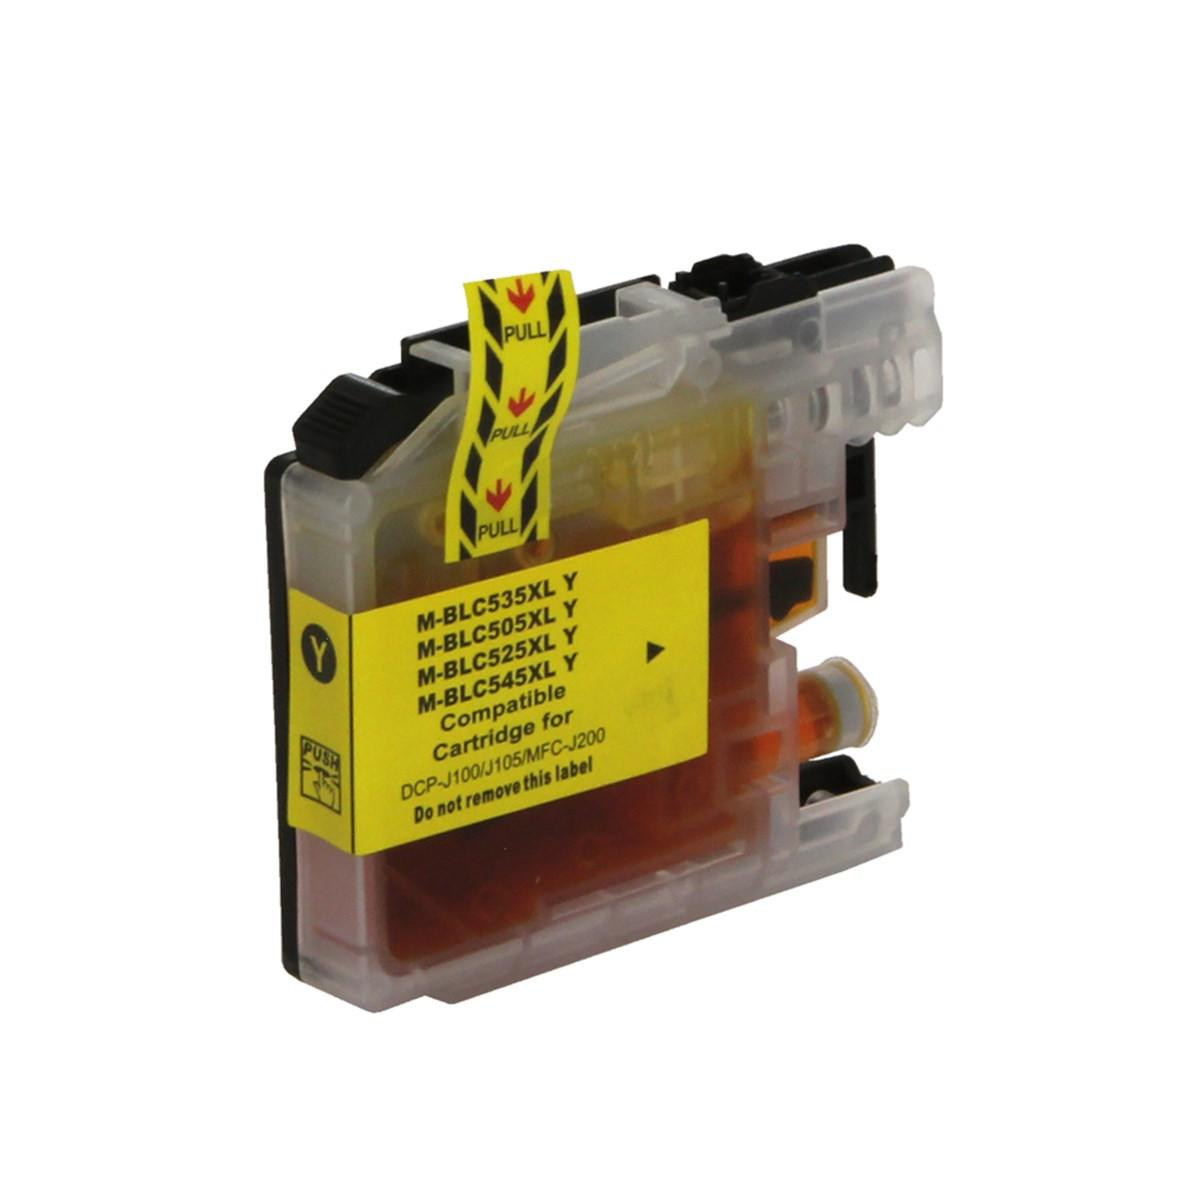 Cartucho de Tinta Compatível com Brother LC-505Y LC505 Amarelo | MFC-J200 DCP-J100 DCP-J105 11ml